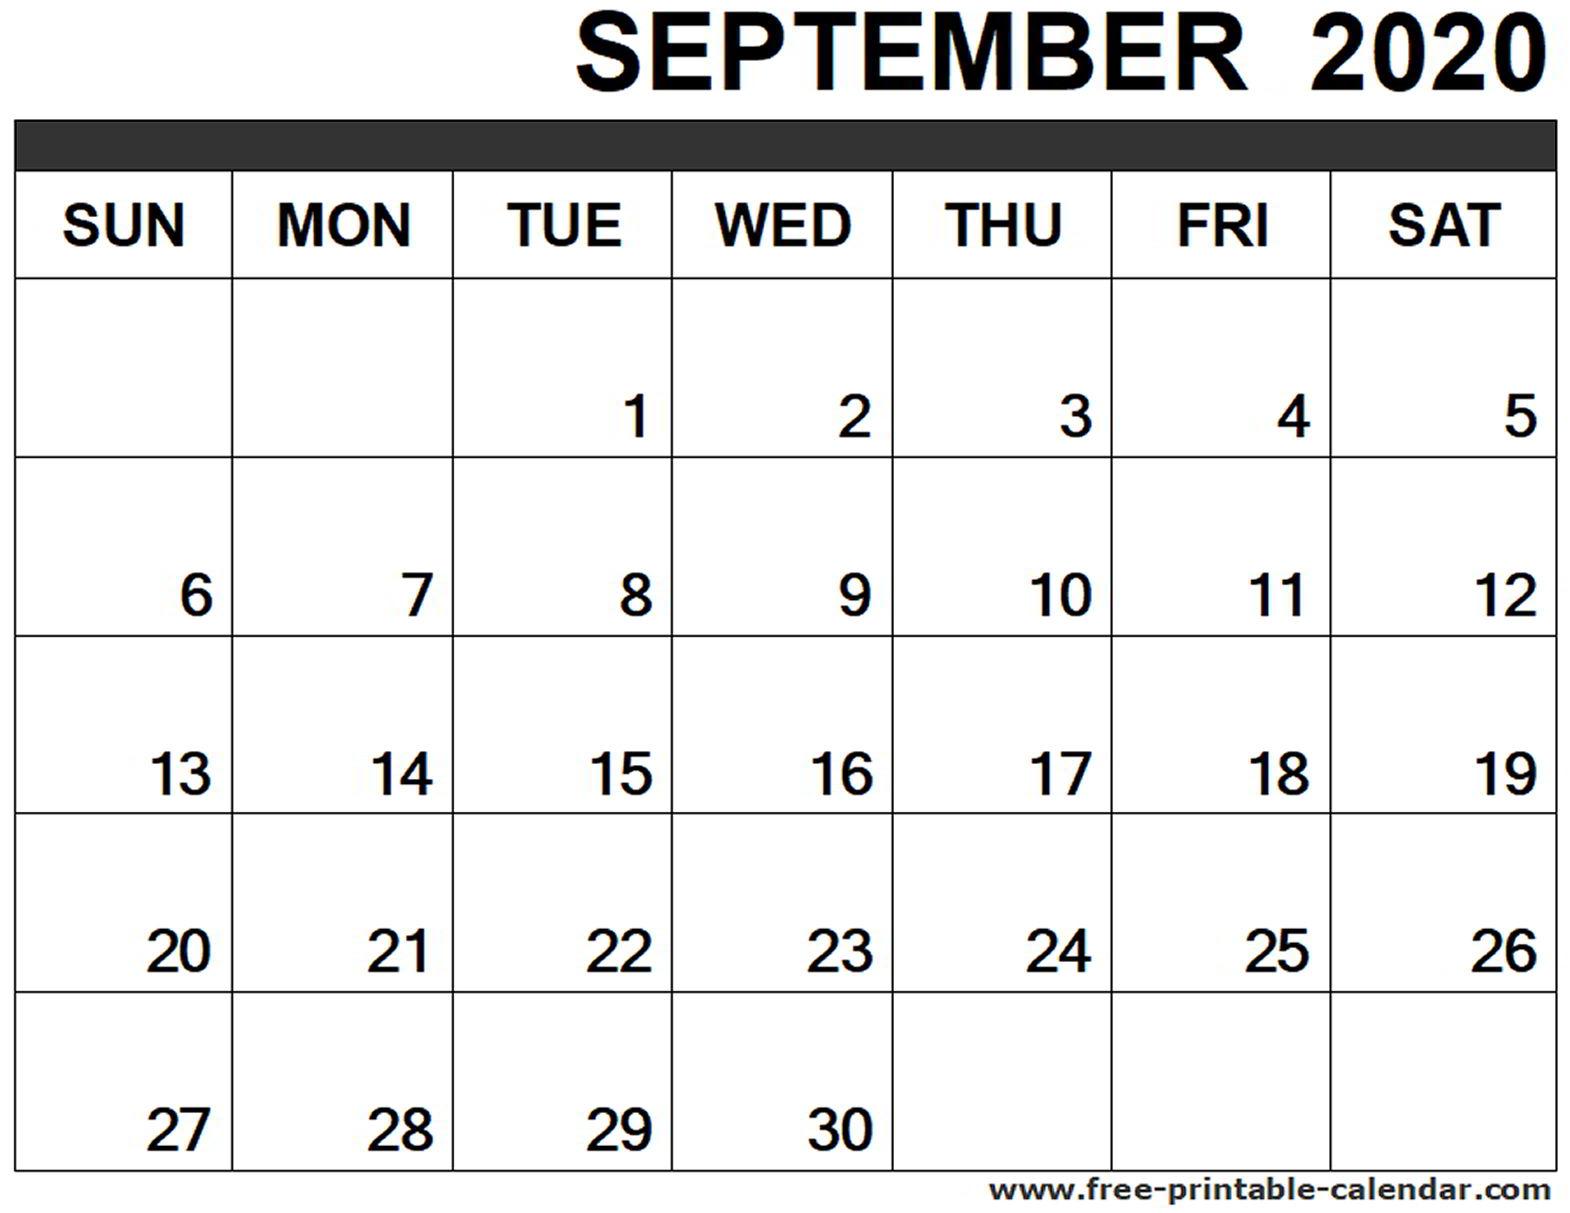 September 2020 Calendar Printable - Free-Printable-Calendar